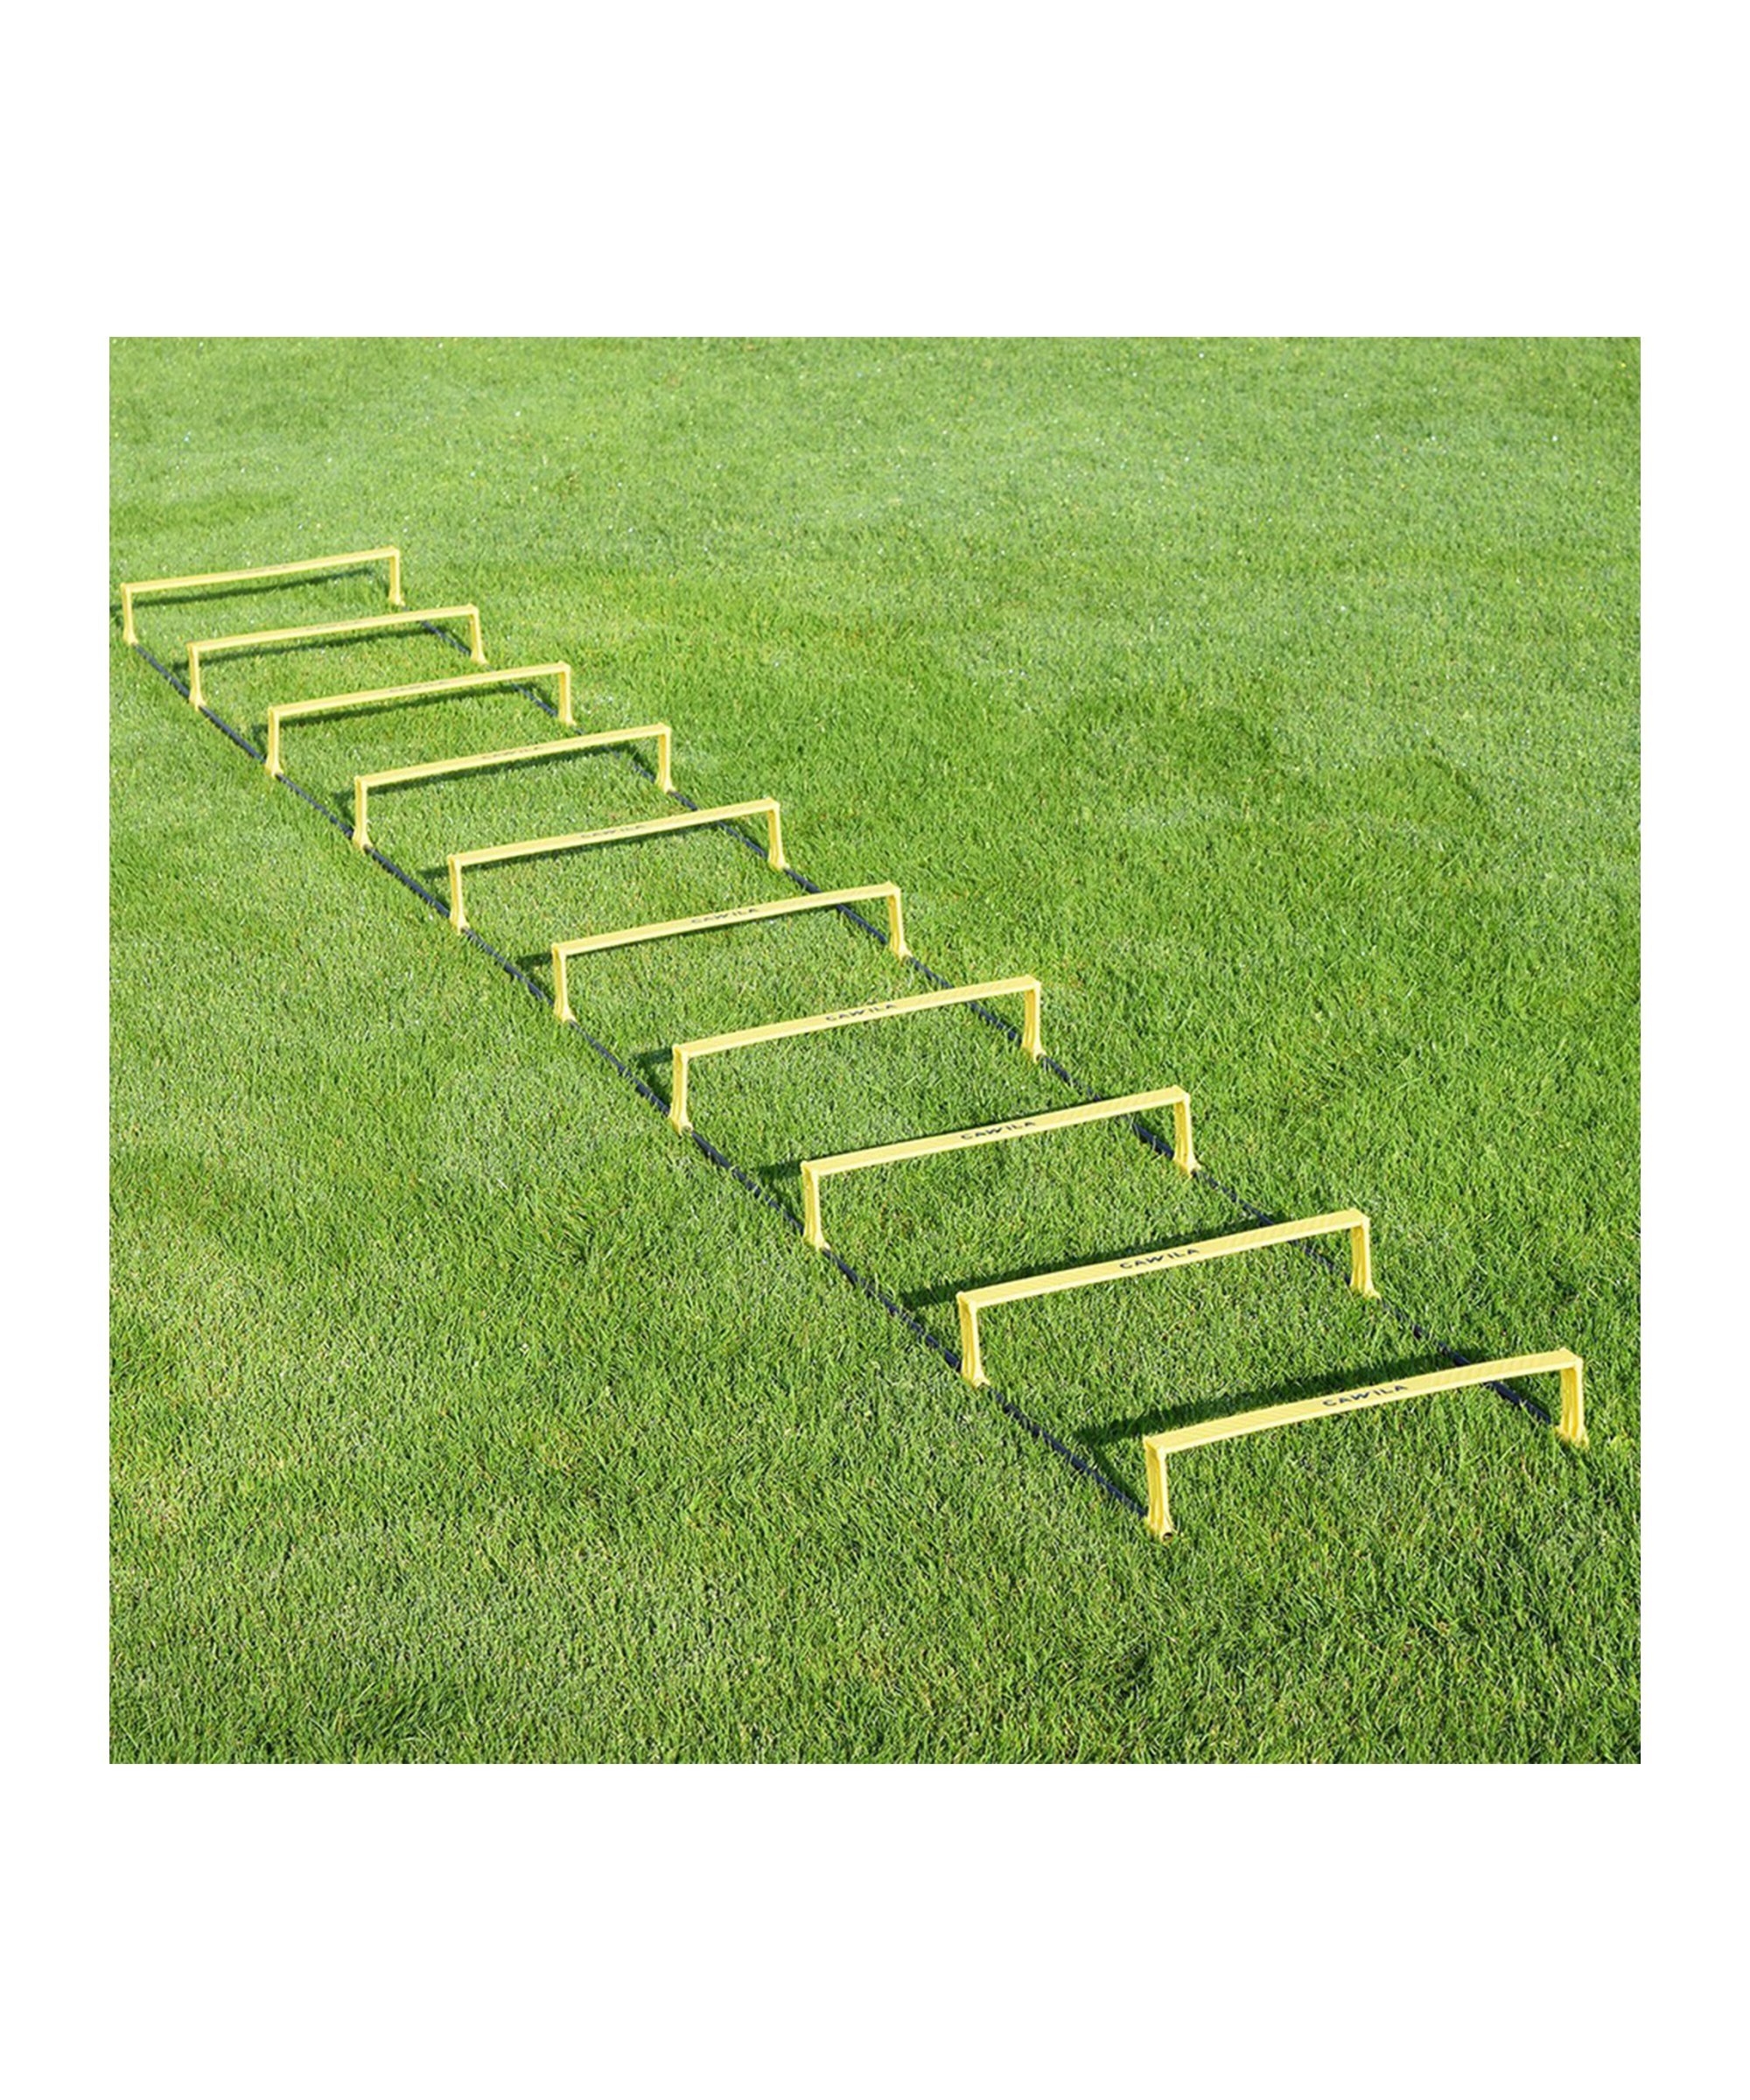 Cawila Step-Koordinationsleiter 6 Stege Gelb - gelb